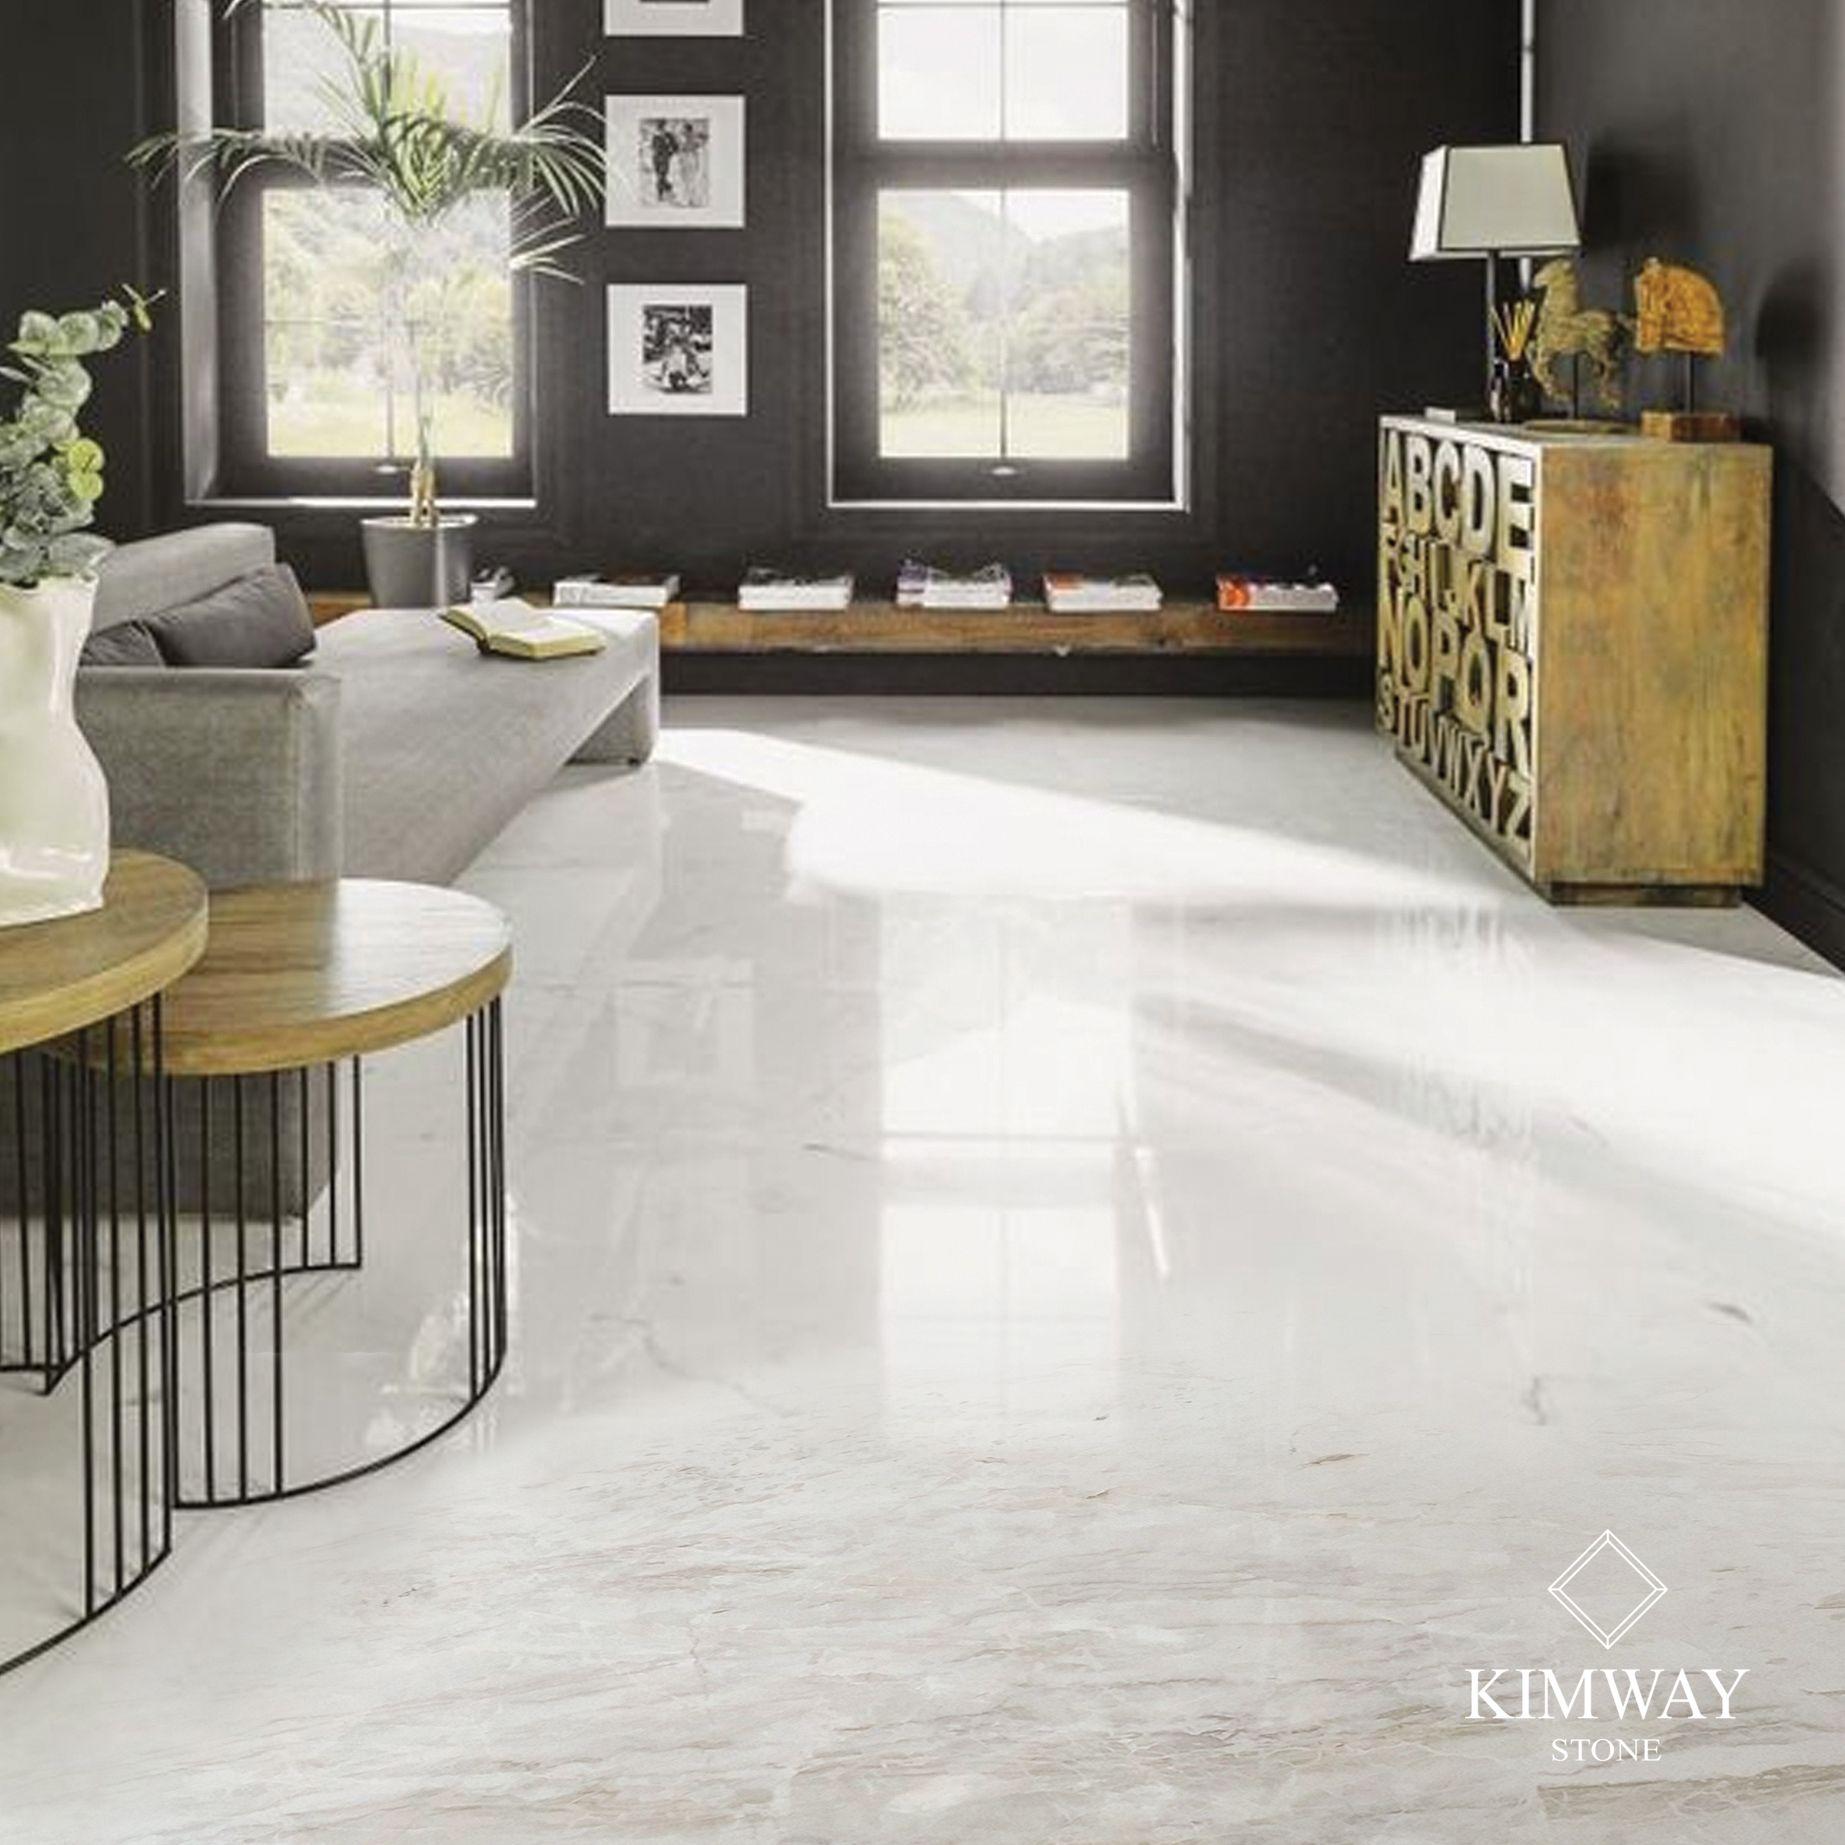 Kimwaystone Living Room Tiles Dining Room Floor Beige Living Rooms